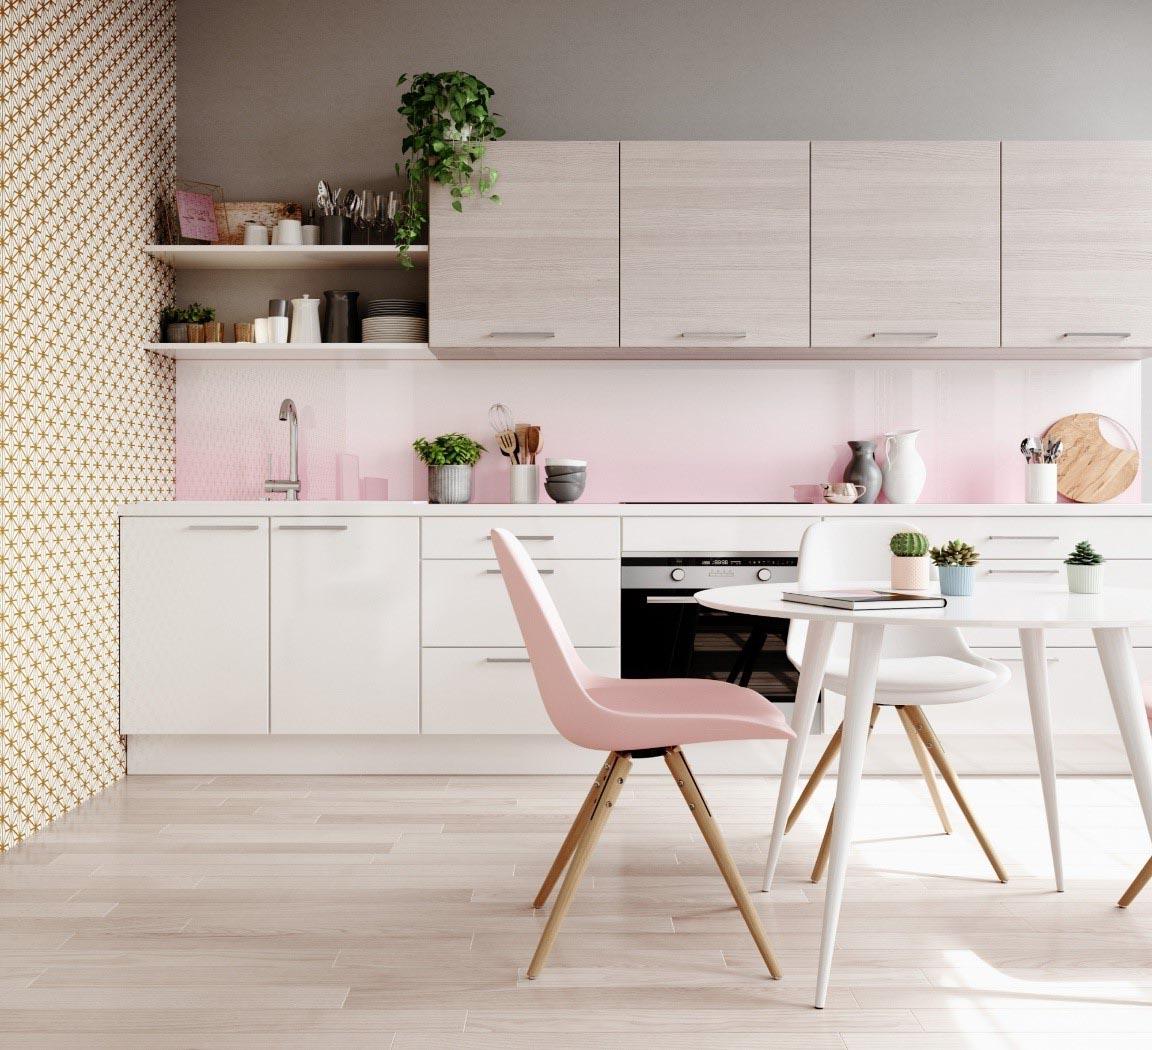 cuisine couleur rose